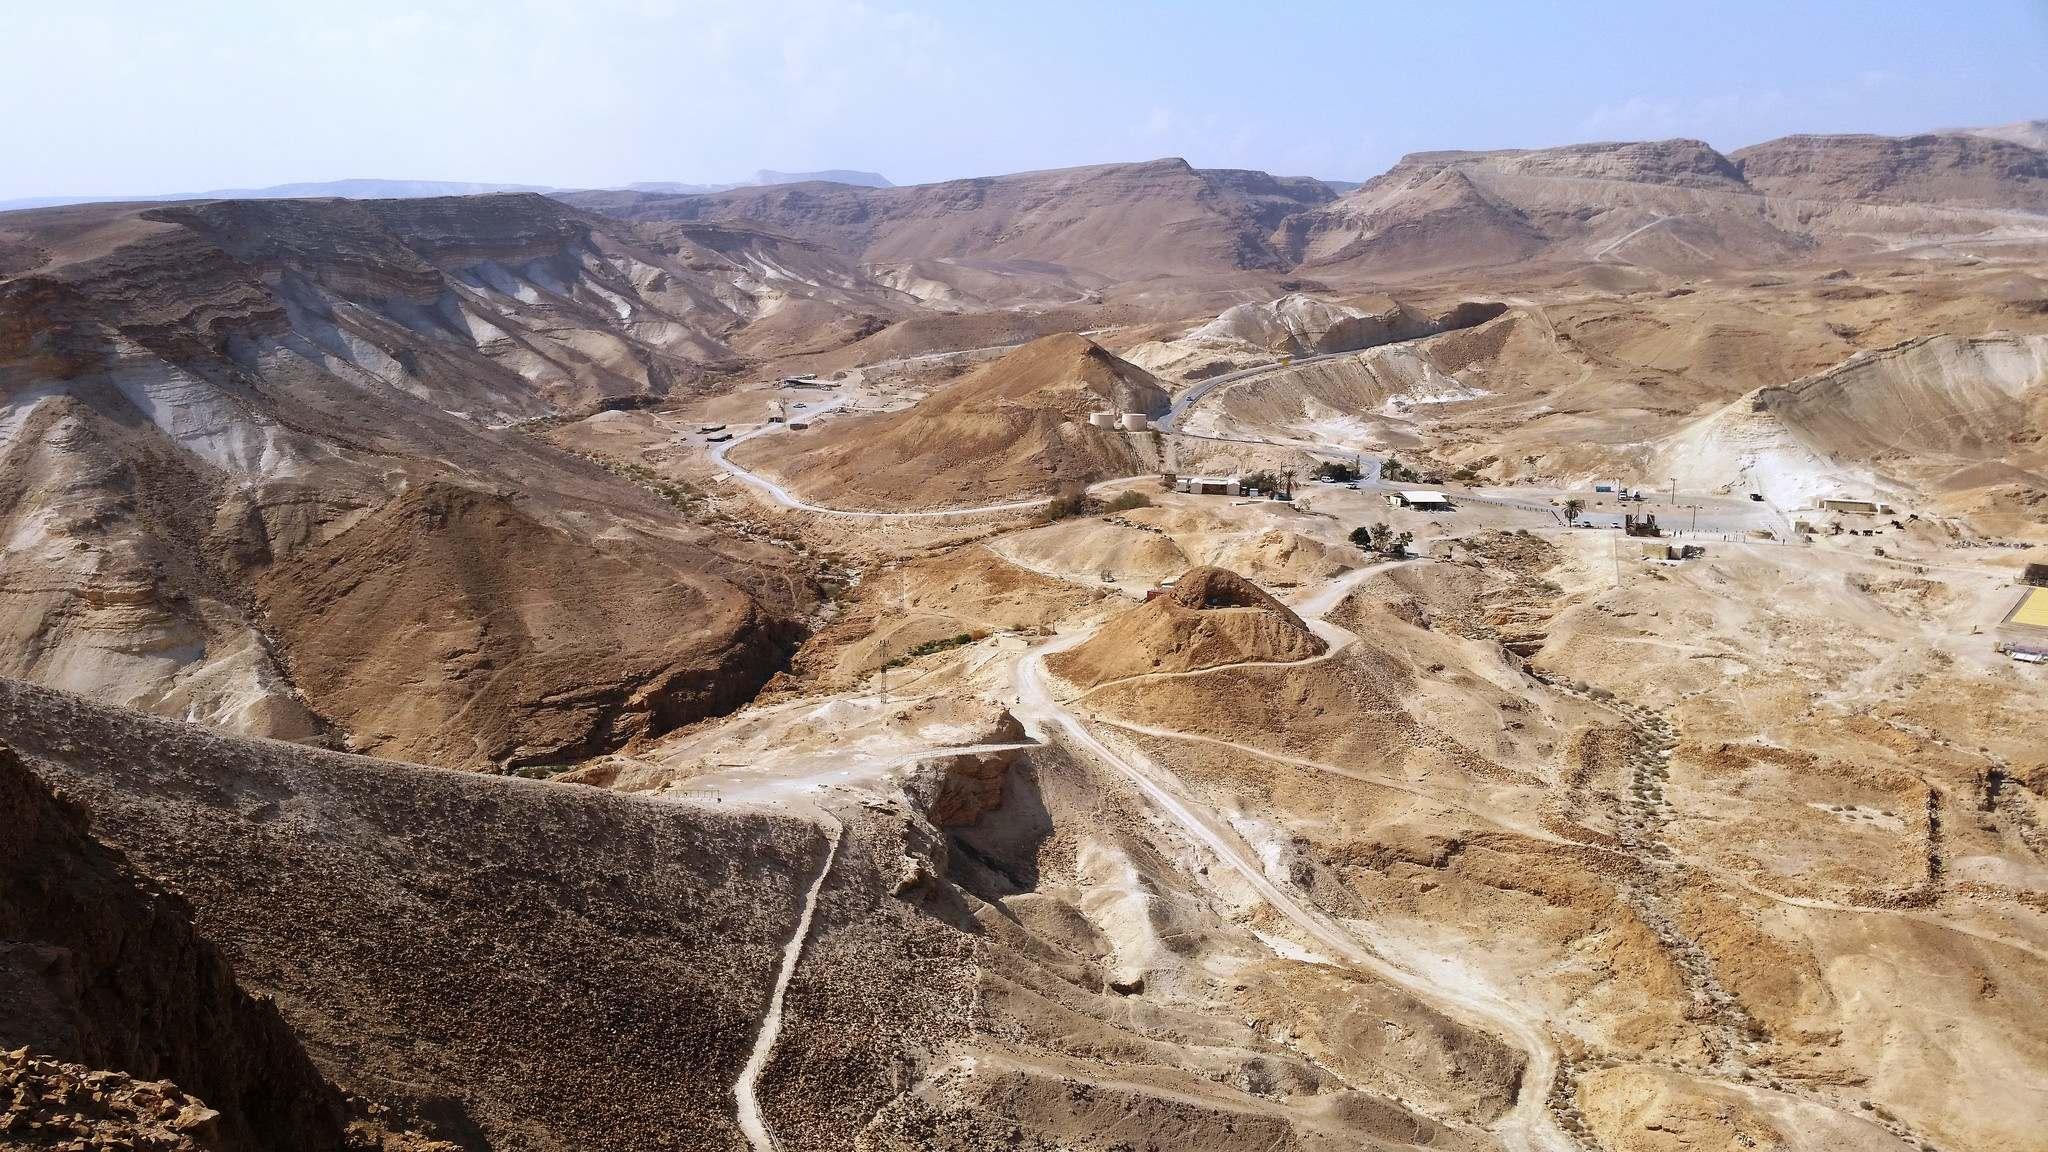 masada10 Masada Desert Fortress in Israel